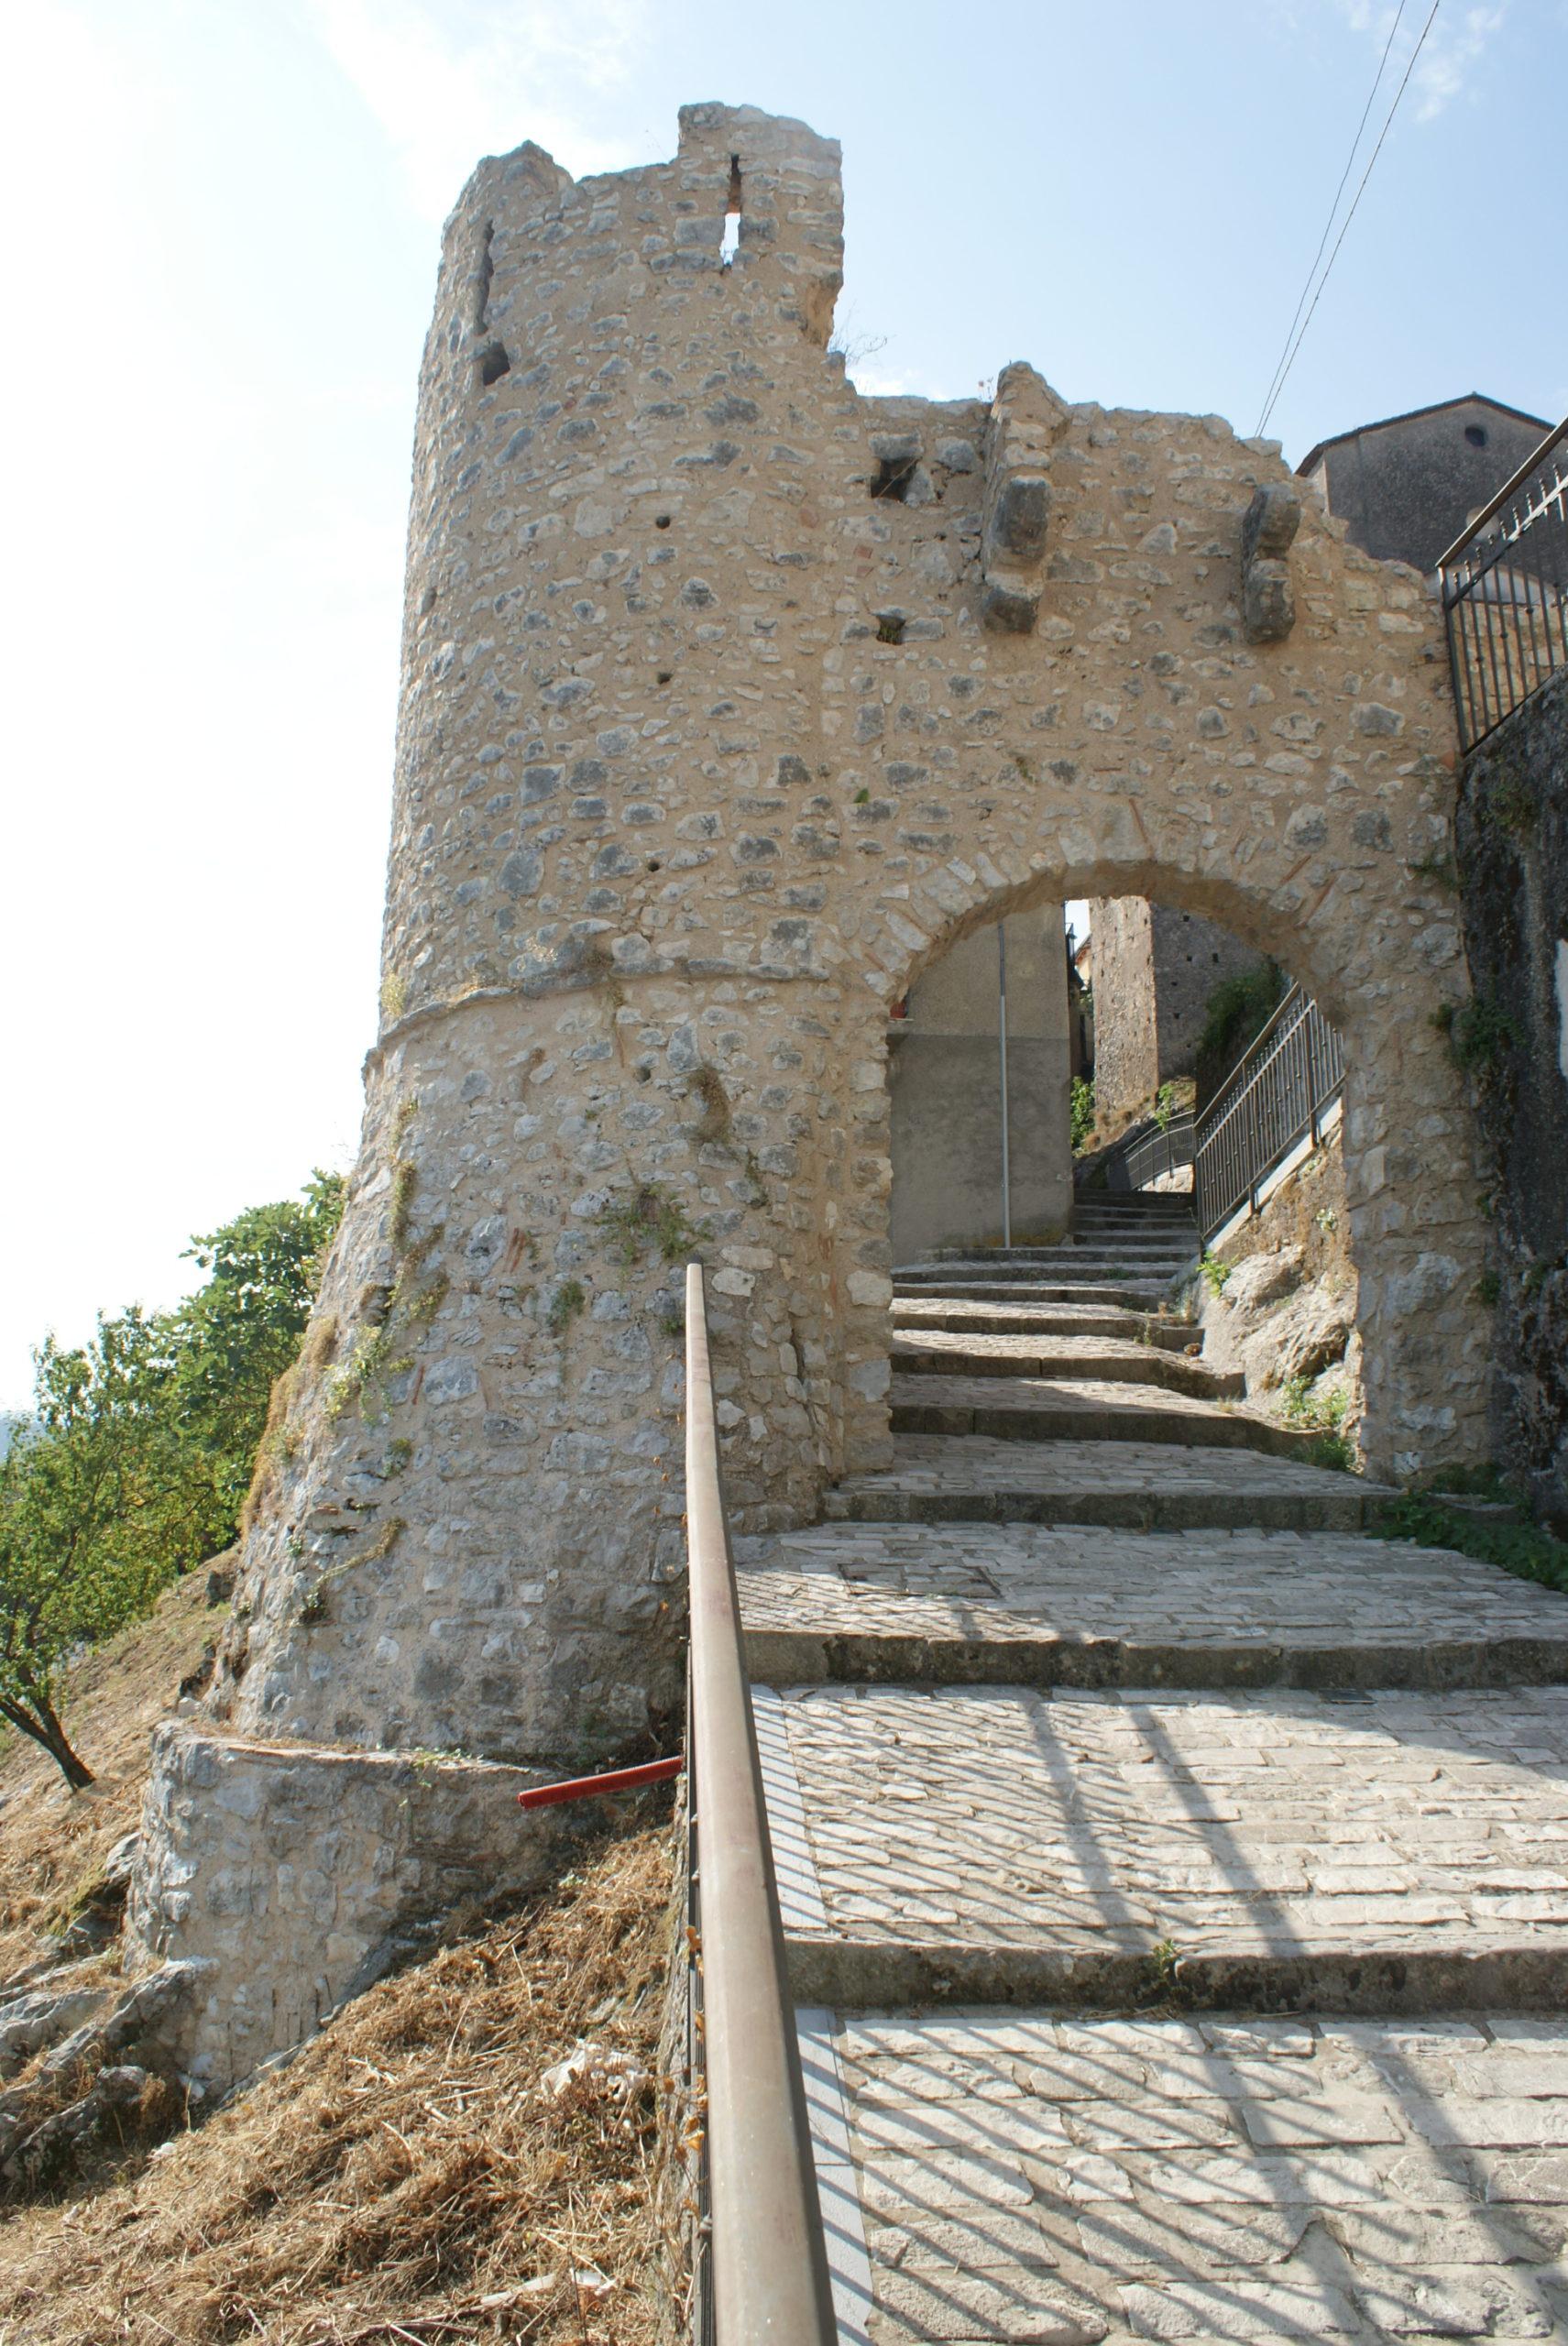 Felitto (Sa) - Torre Medioevale